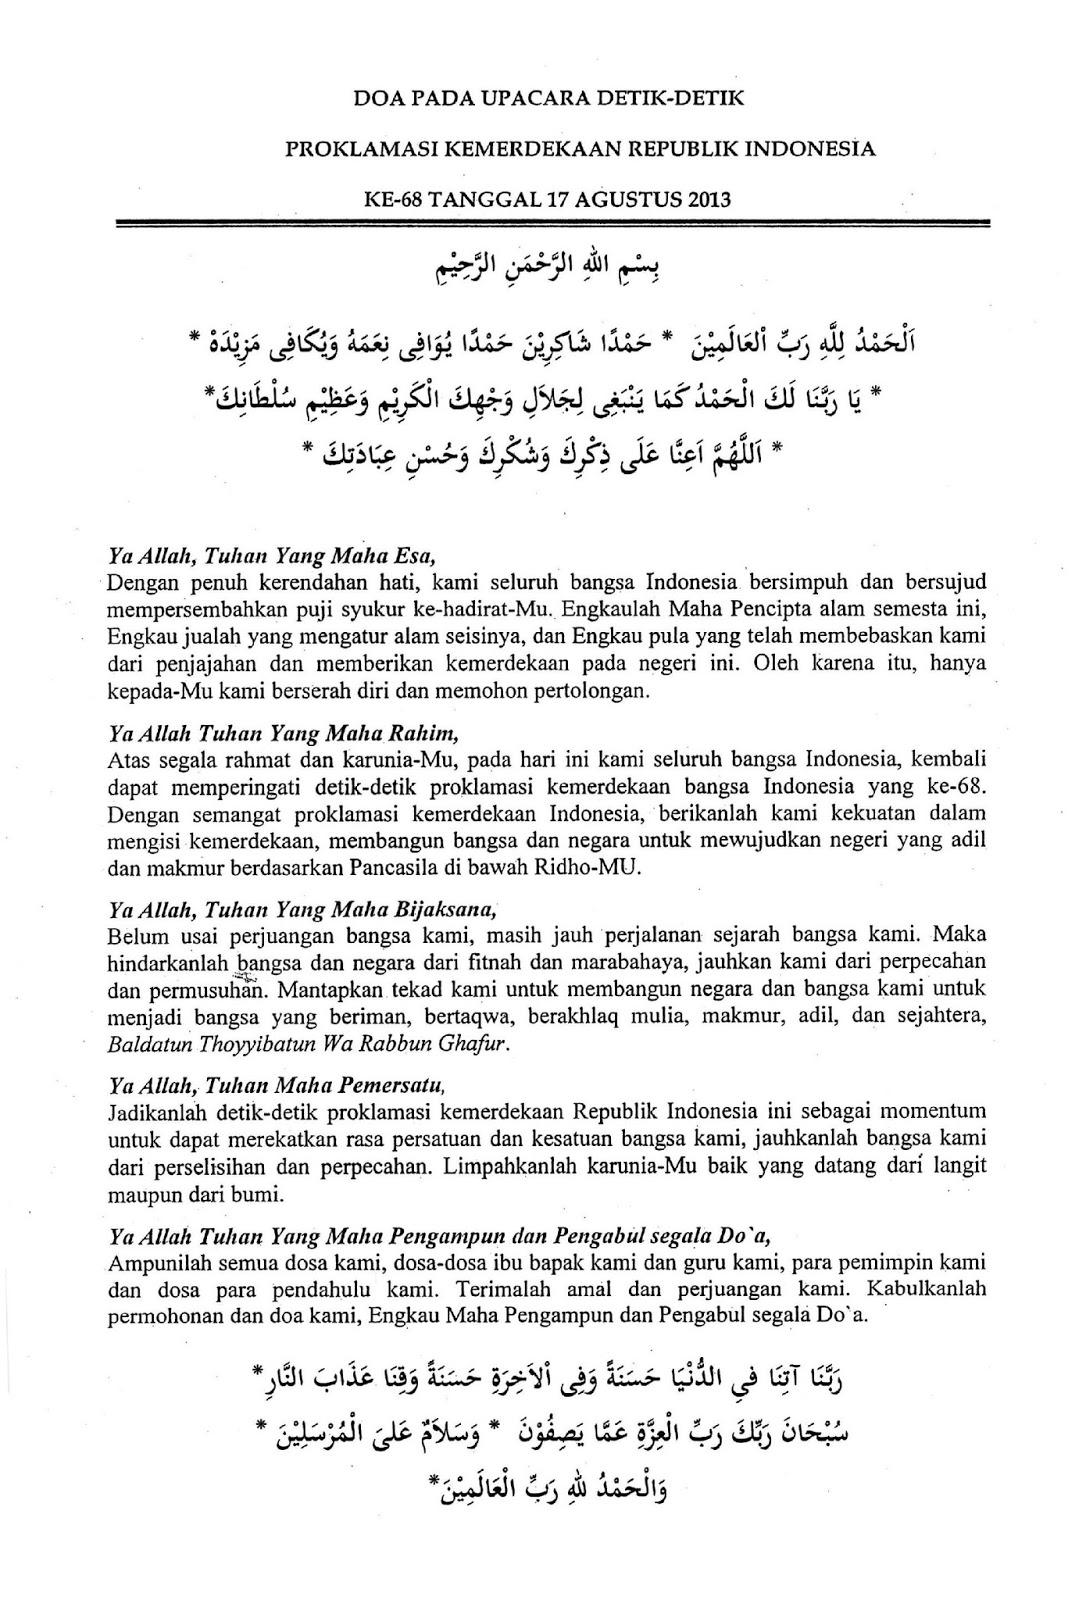 Teks doa pada saat Upacara Detik detik Proklamasi Kemerdekaan RI ke 68